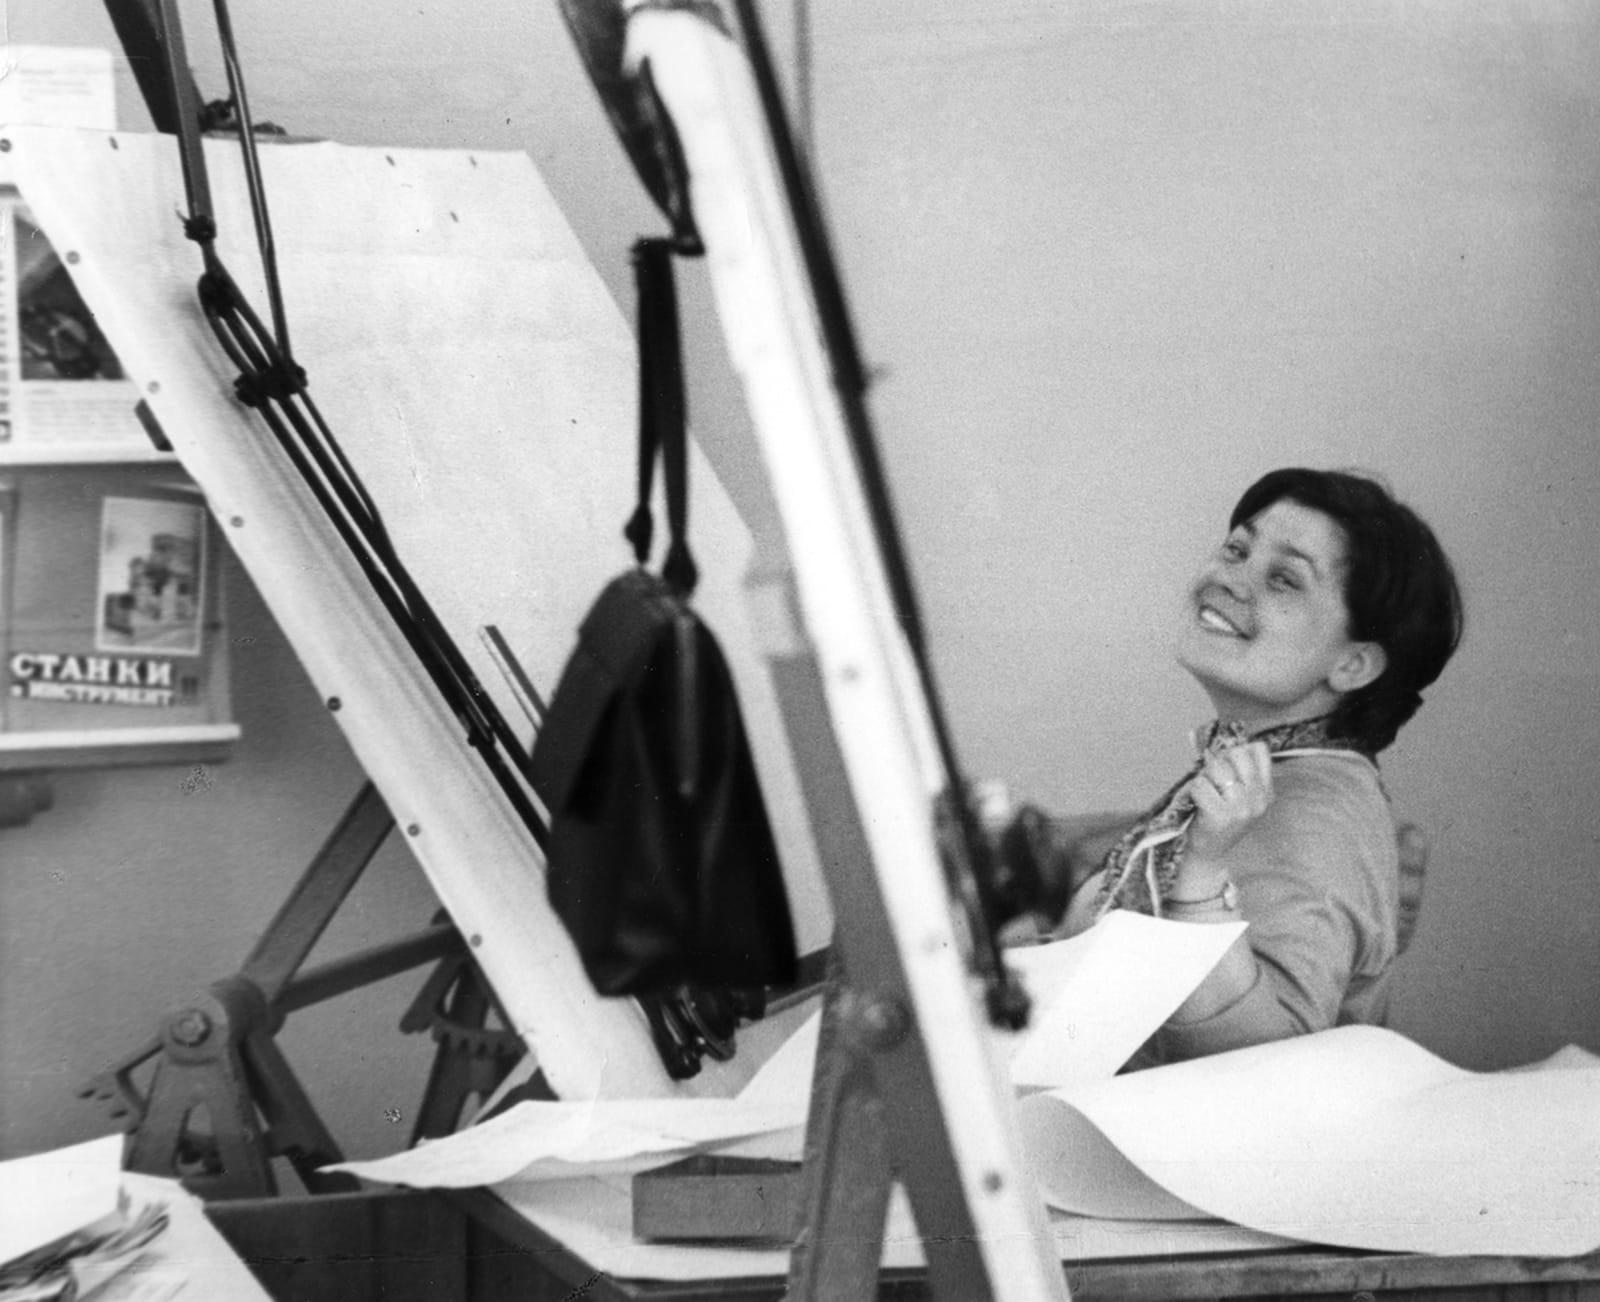 Bonne humeur (Moscou, 1968)